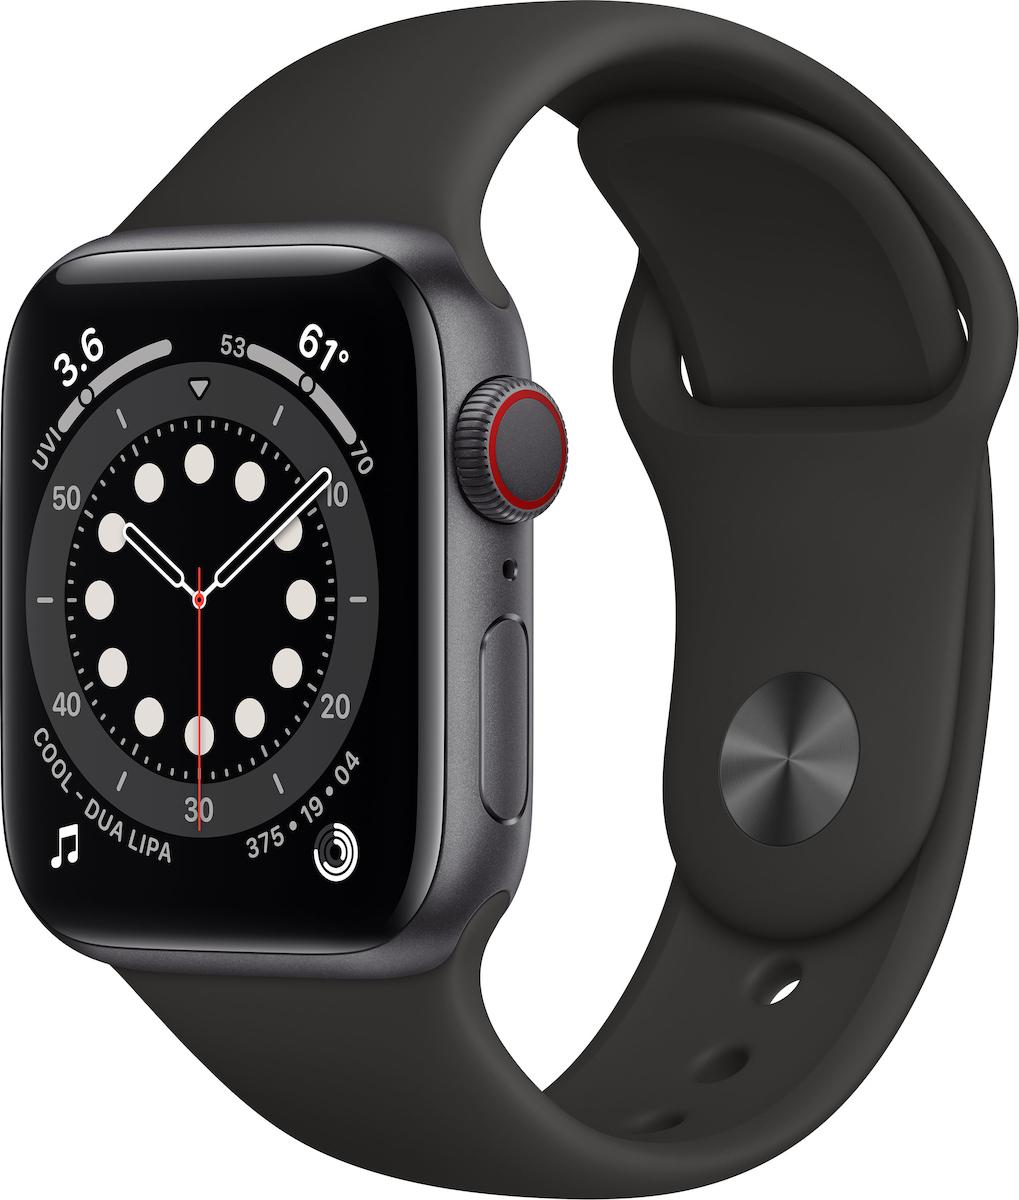 Apple Watch Series 6 Aluminium Cellular 40mm (Space Gray) (M06P3WB/A) - Πληρωμή και σε έως 36 Δόσεις!!!